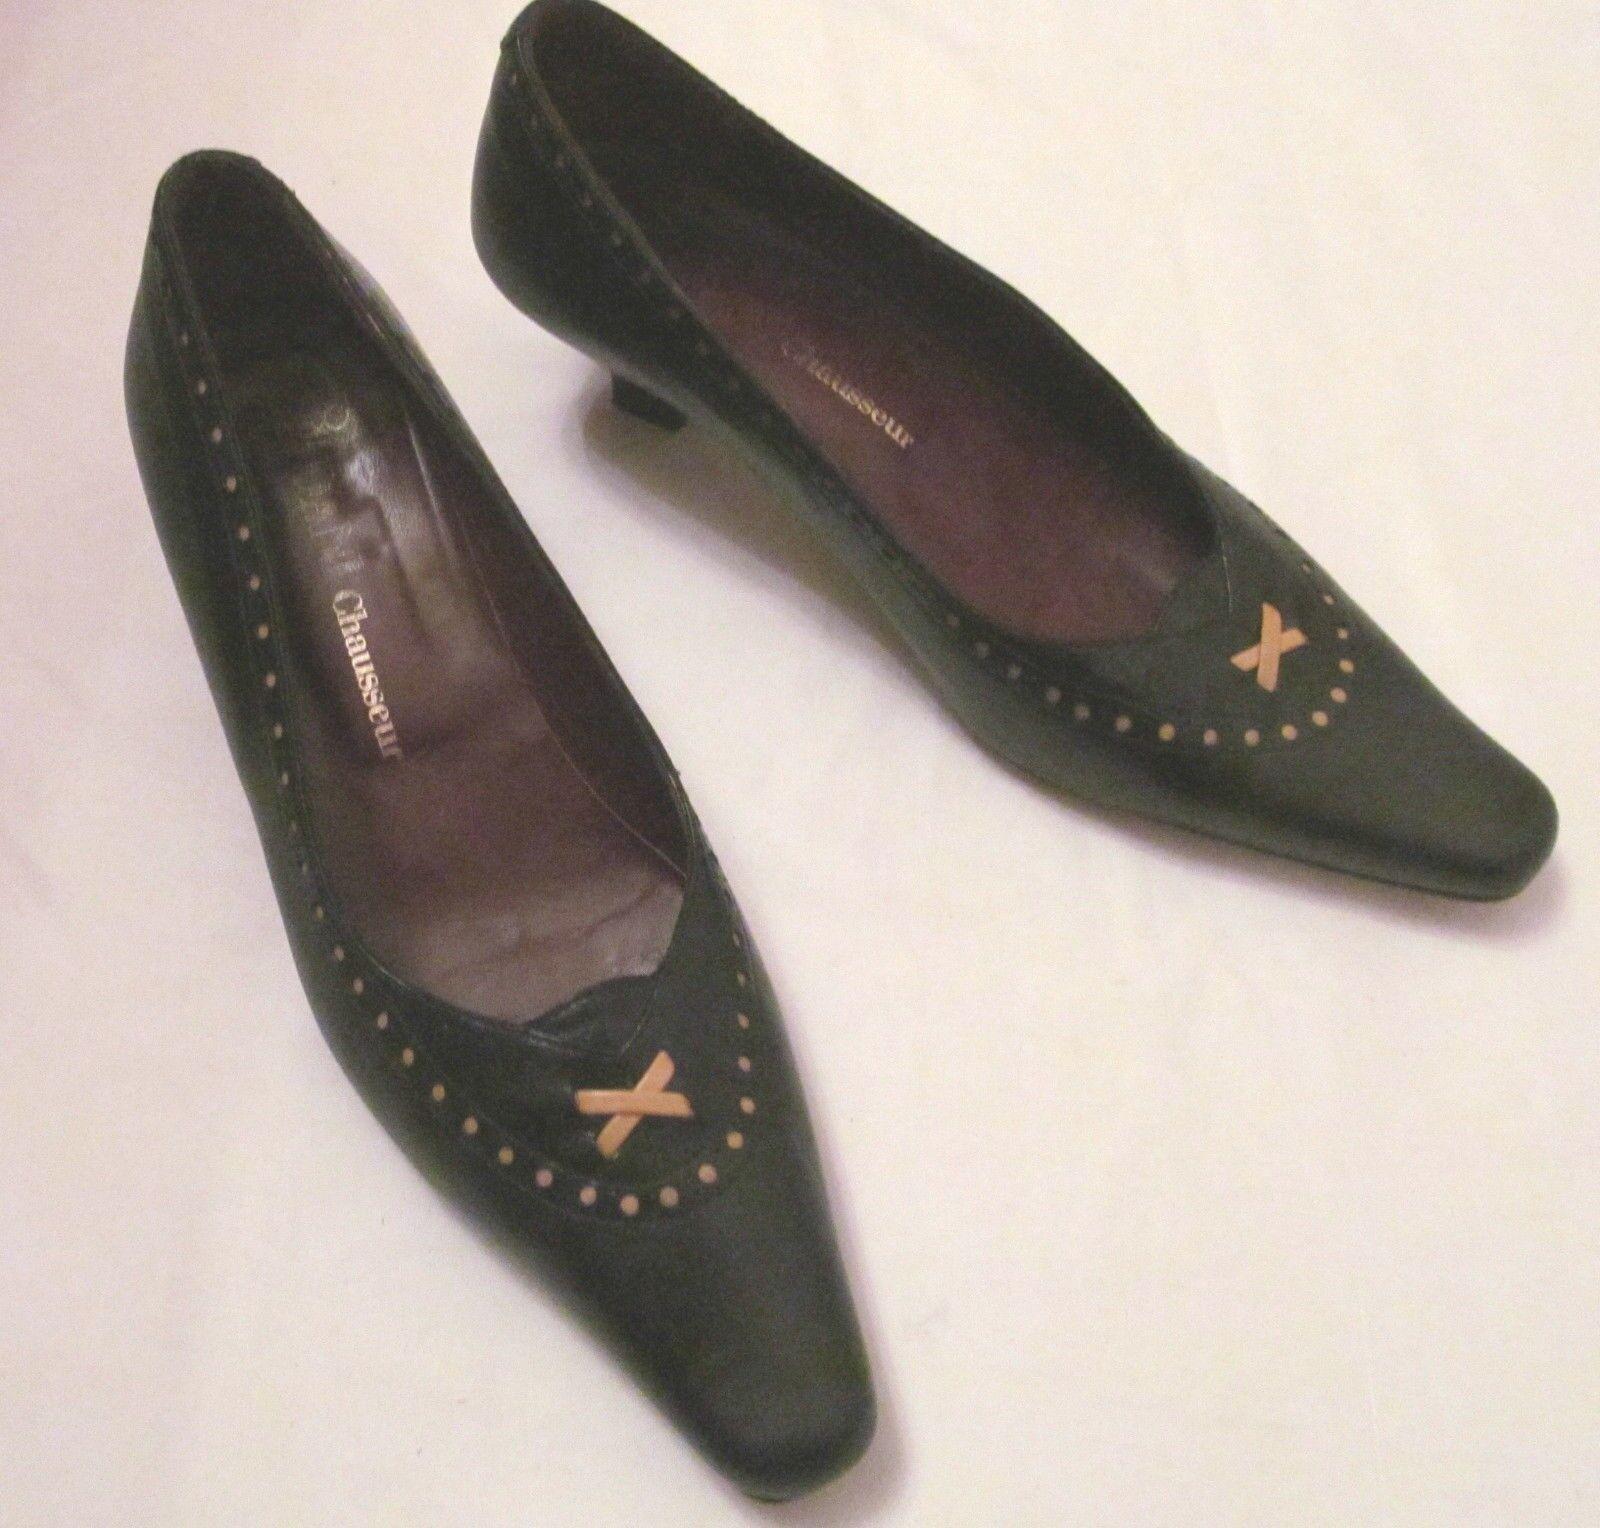 Shoe polish stripper, japaness asian tits lactating